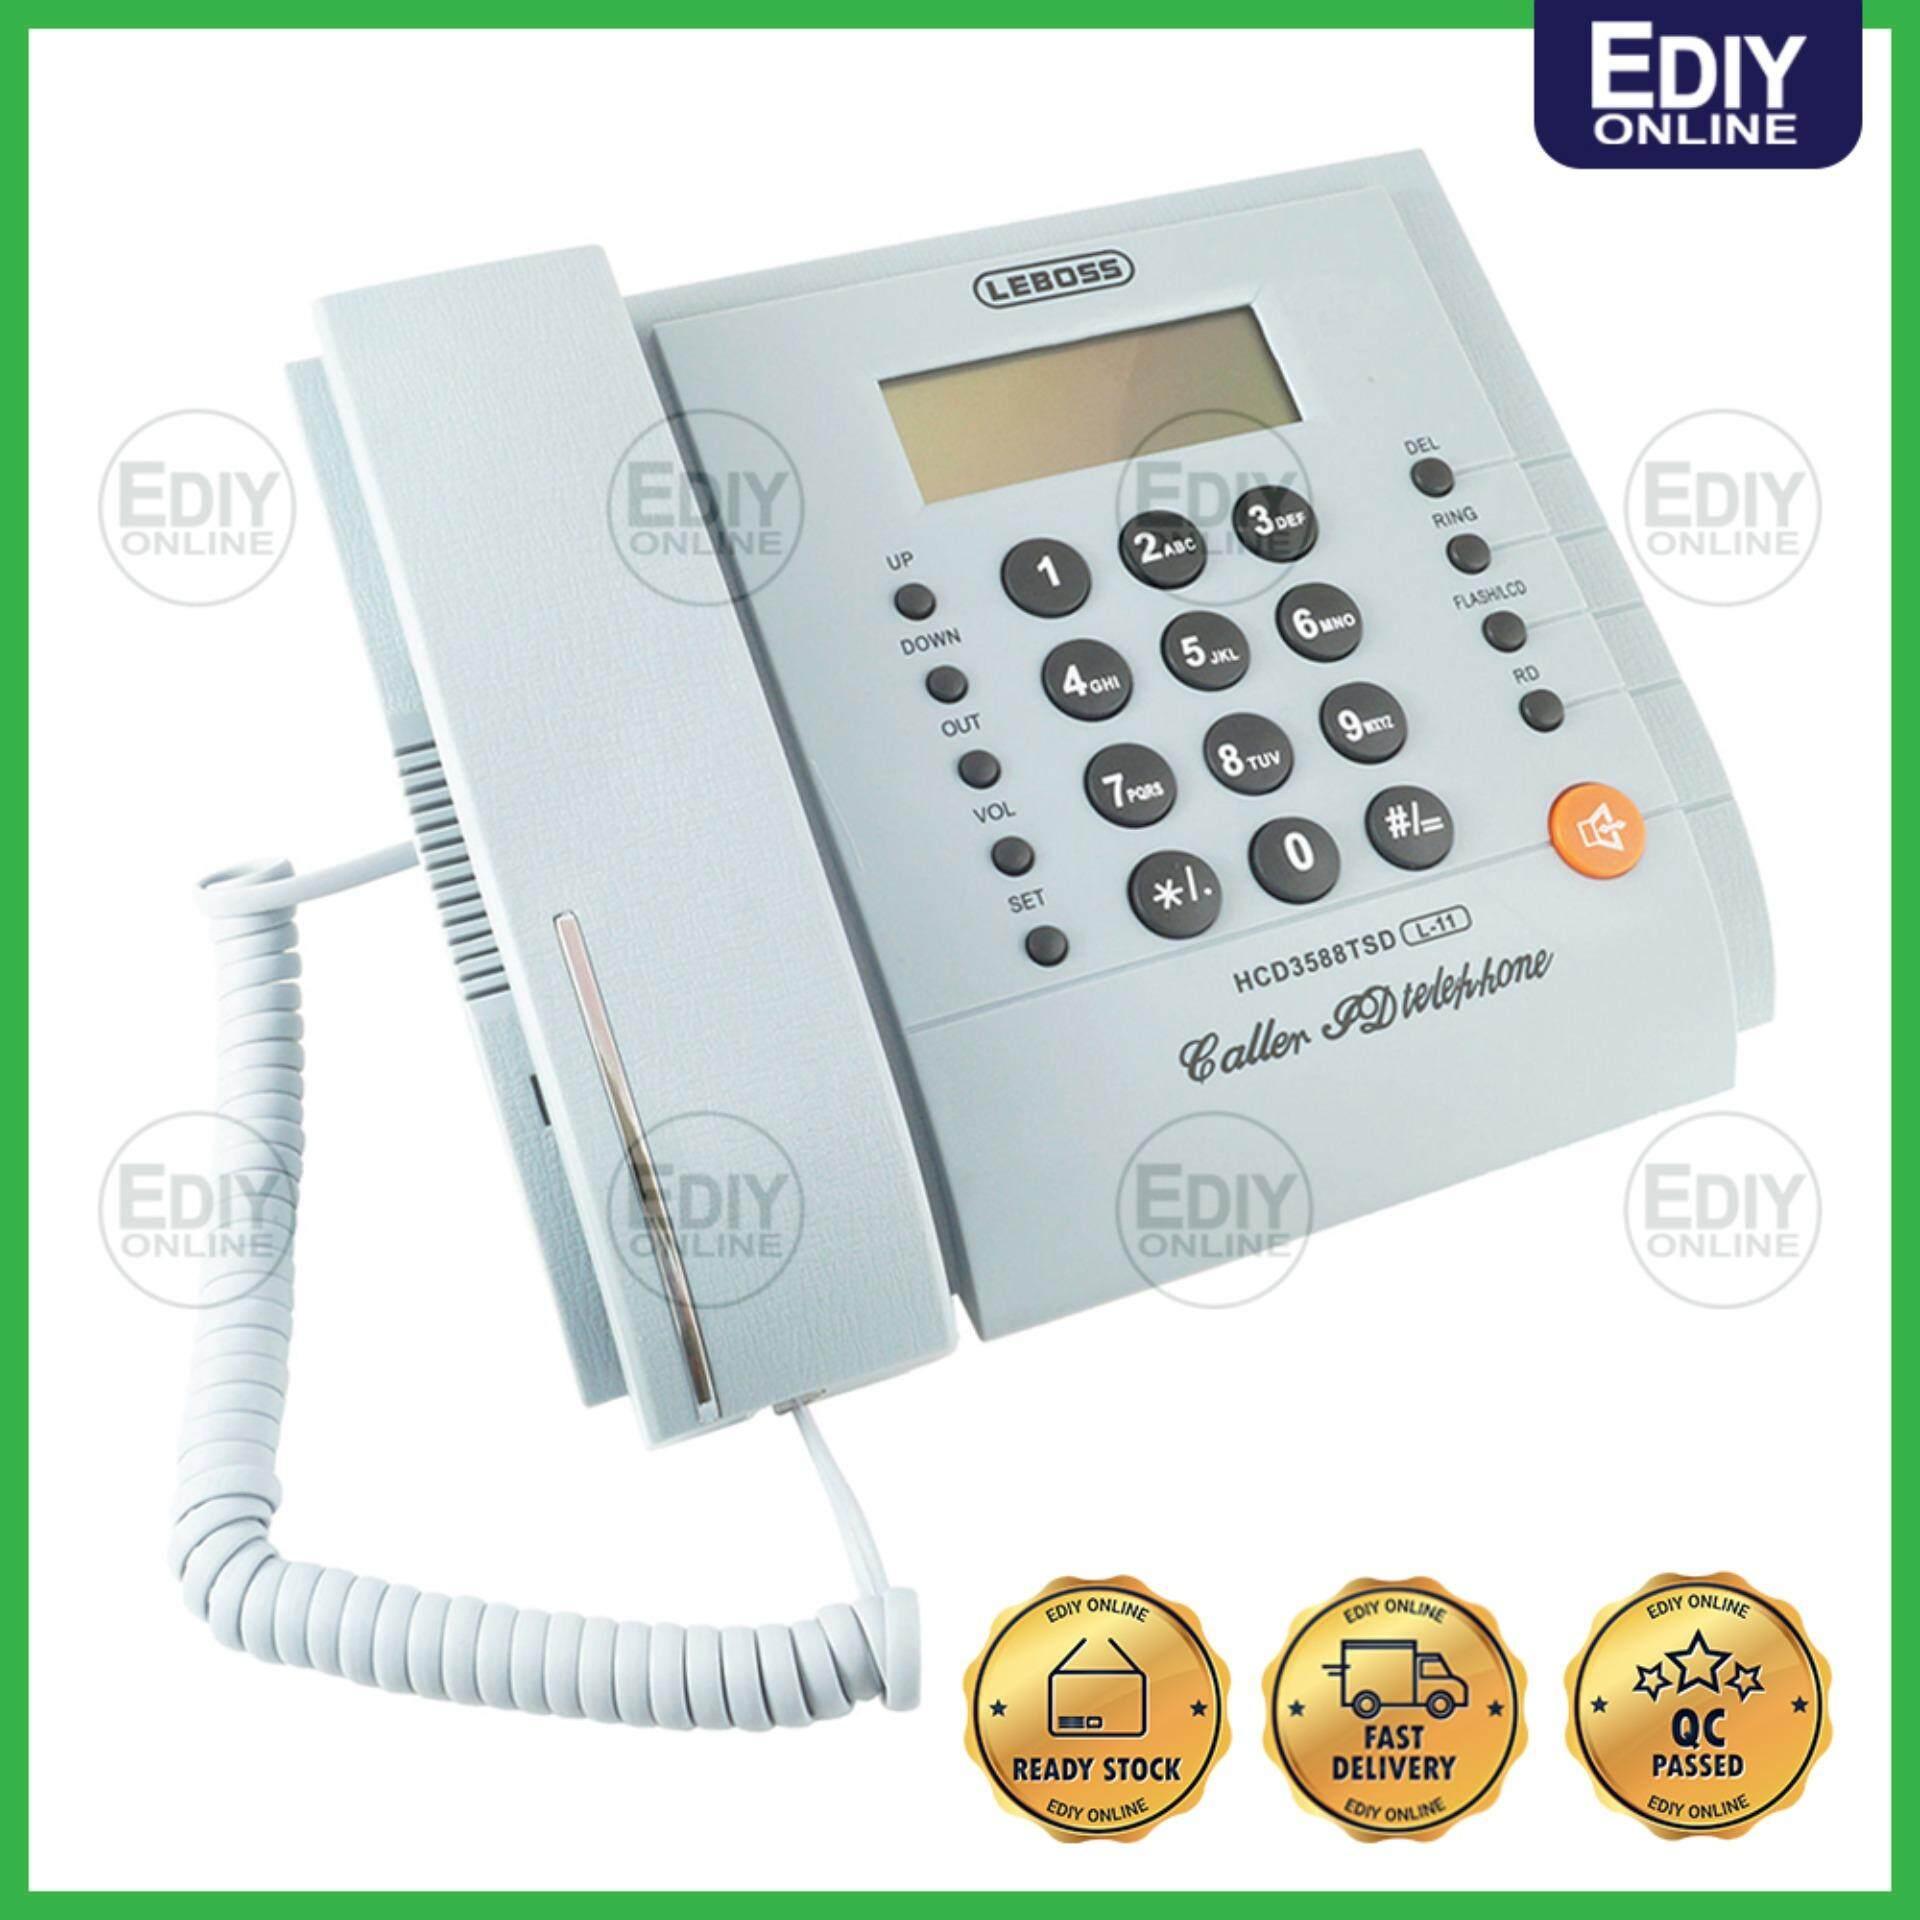 LEBOSS CALLER ID TELEPHONE HCD3588TSD L-11 (RANDOM COLOR) _3601010 [EXTRA BOX PACKING]